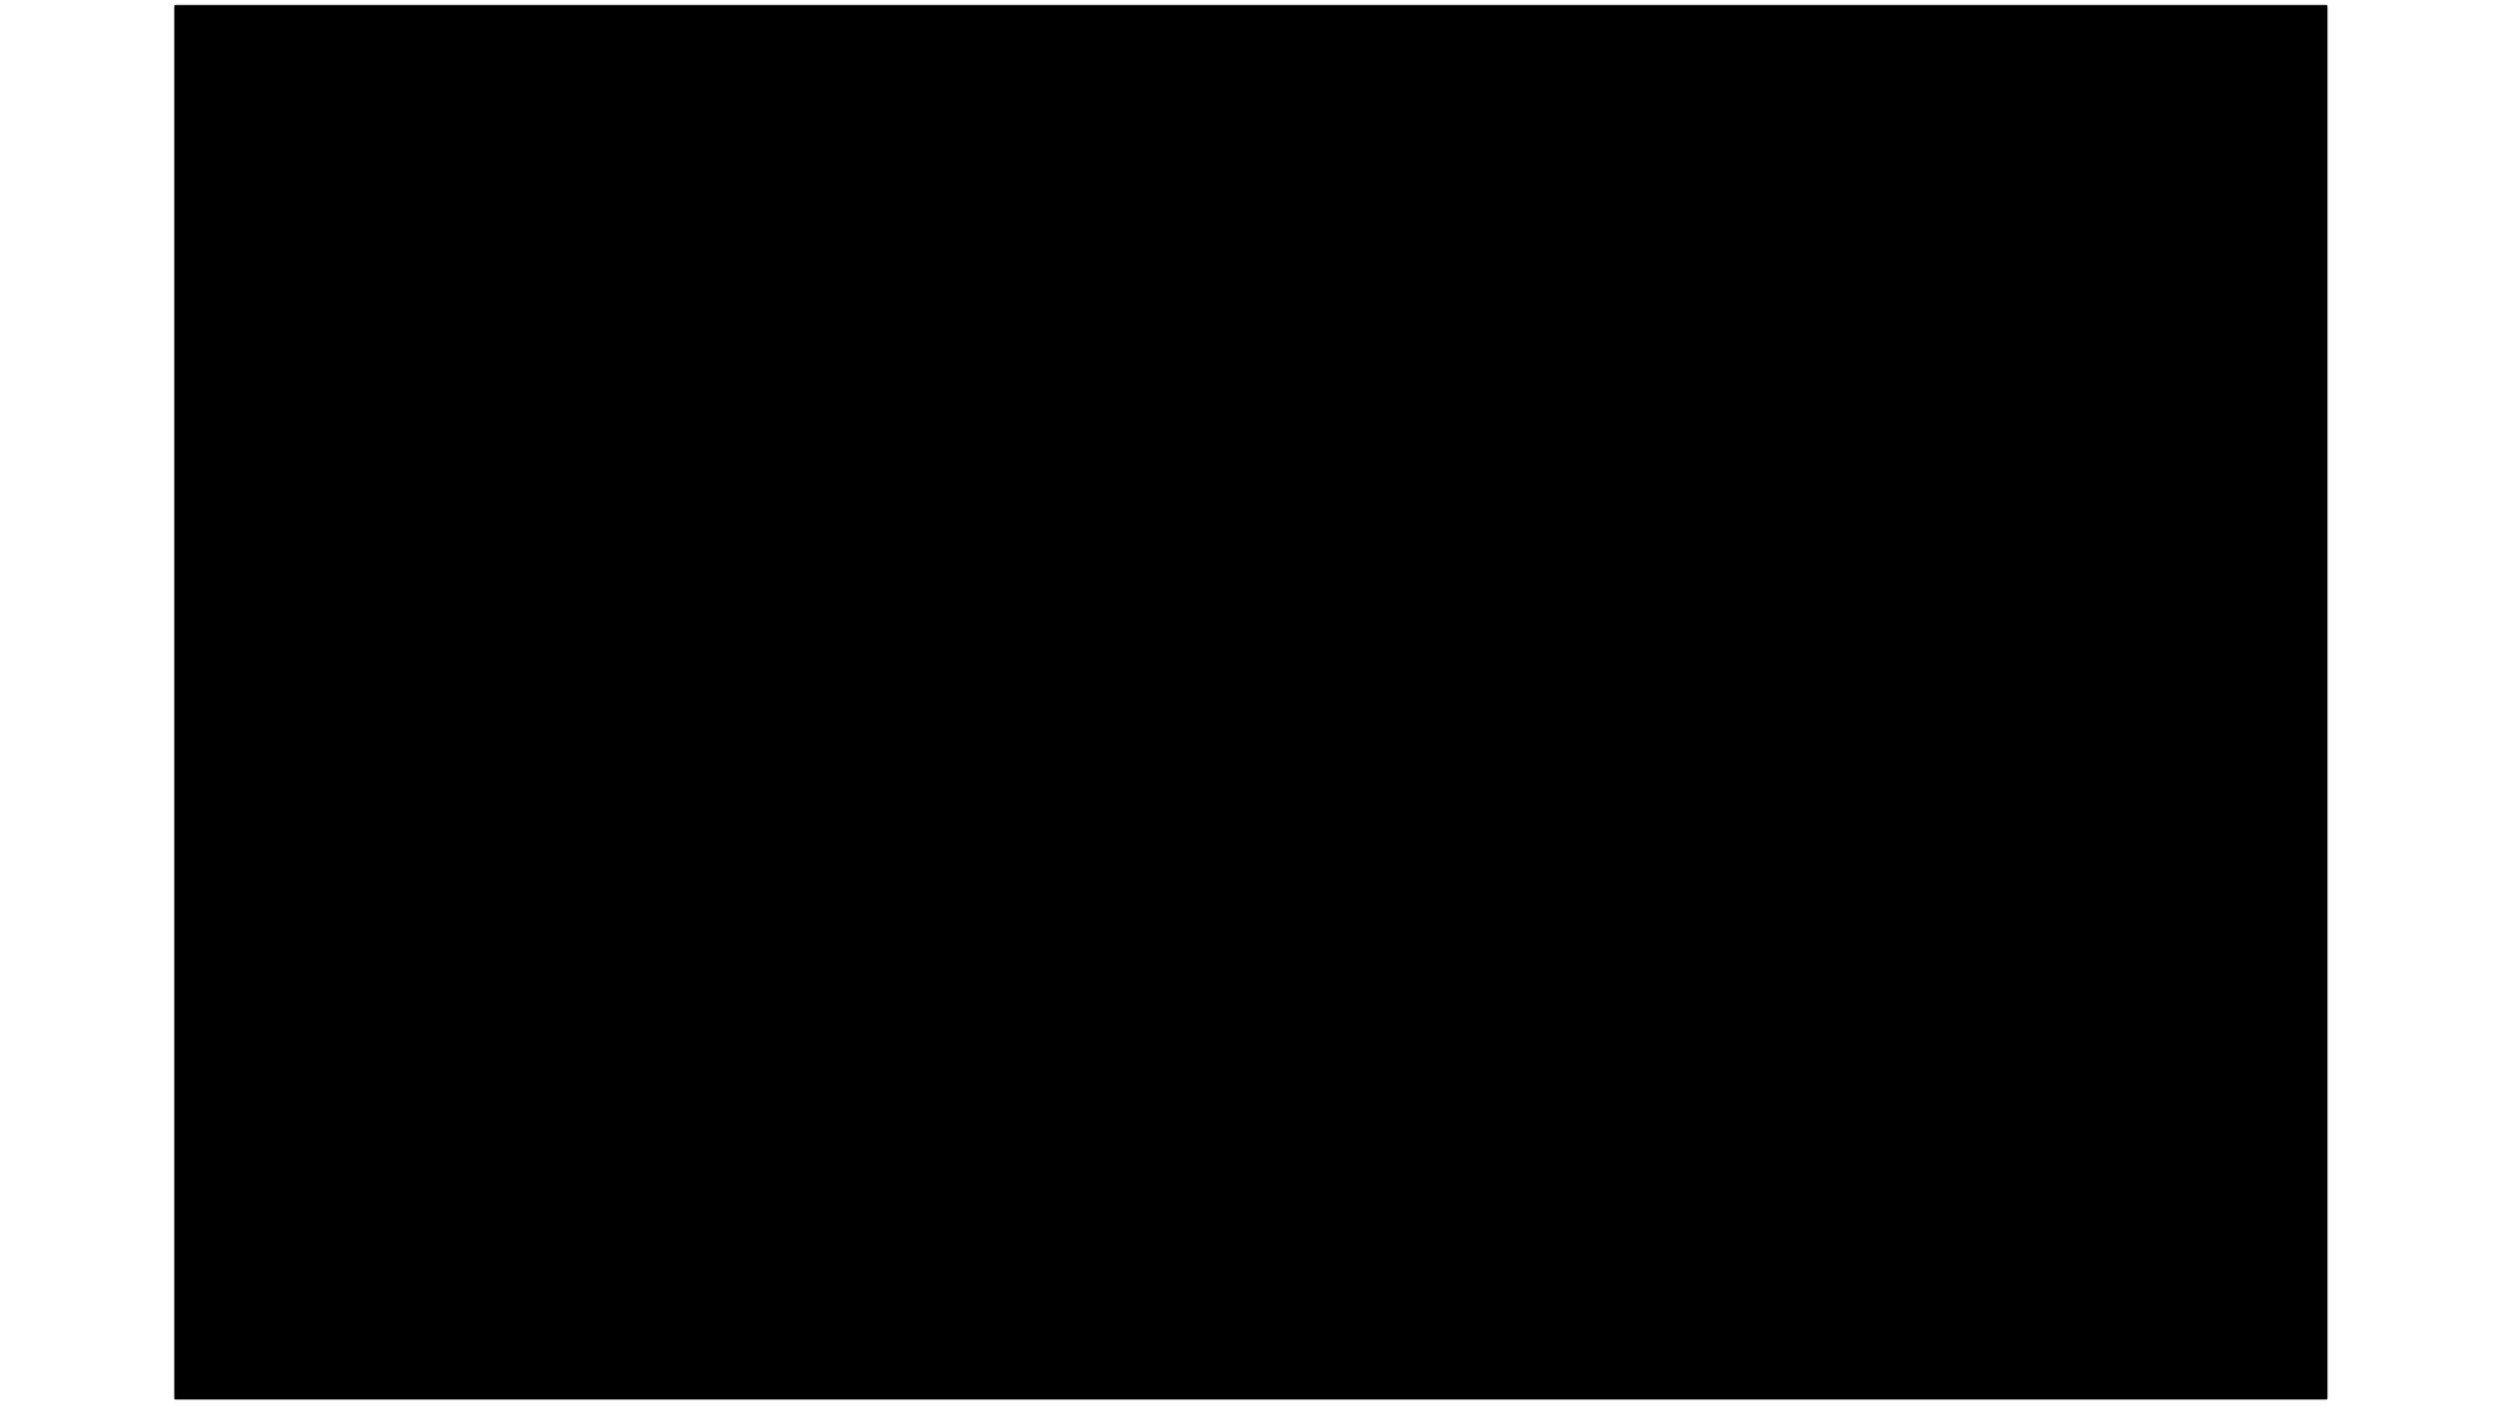 GD148.jpg